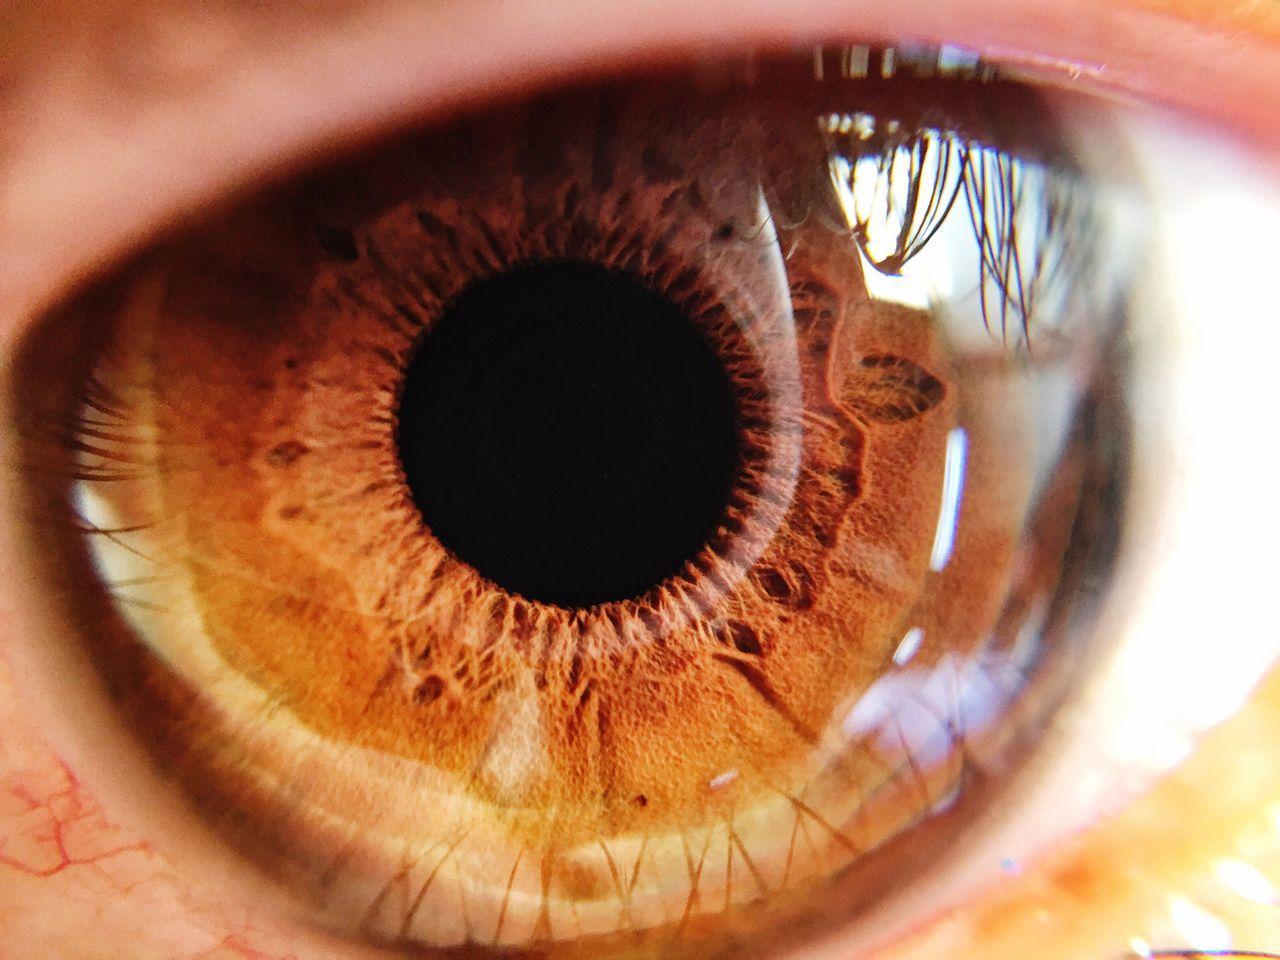 human eye, eyelash, eyesight, sensory perception, eyeball, human body part, iris - eye, one person, reflection, real people, macro, close-up, outdoors, day, people